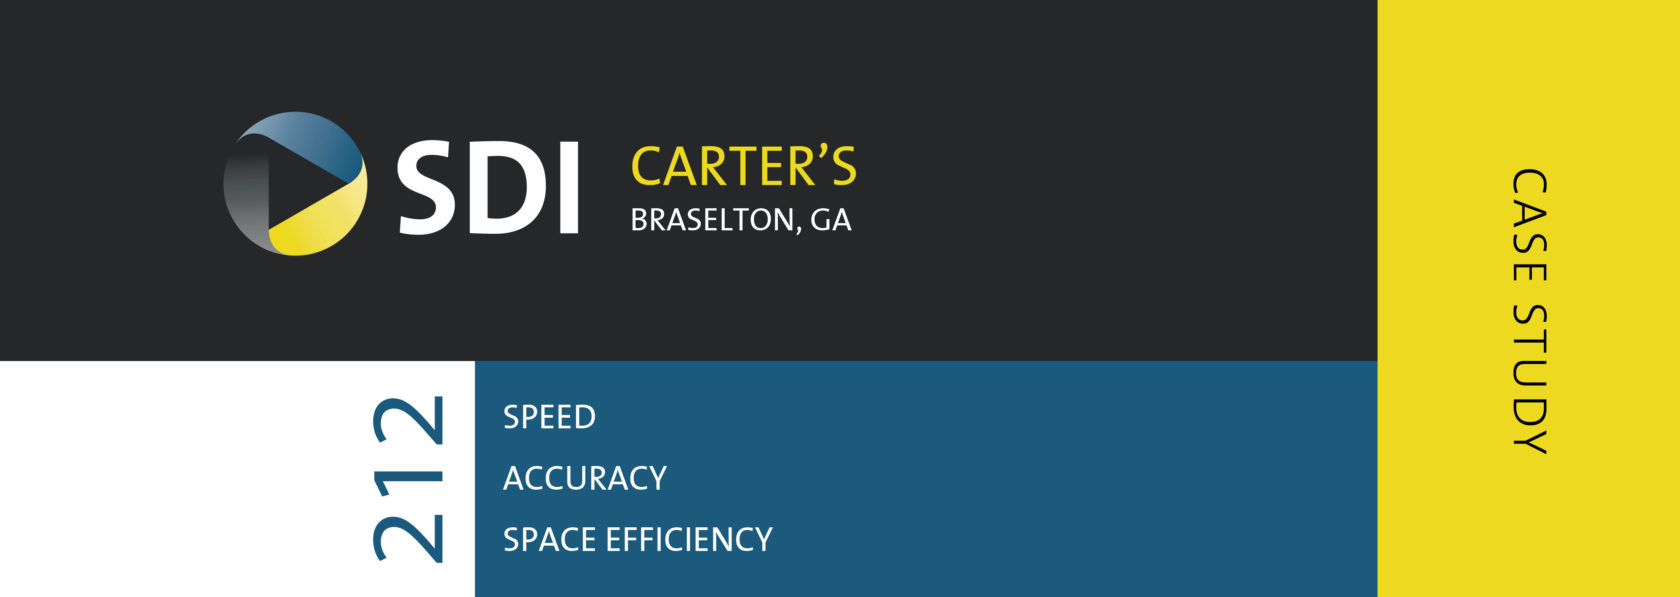 carter-03